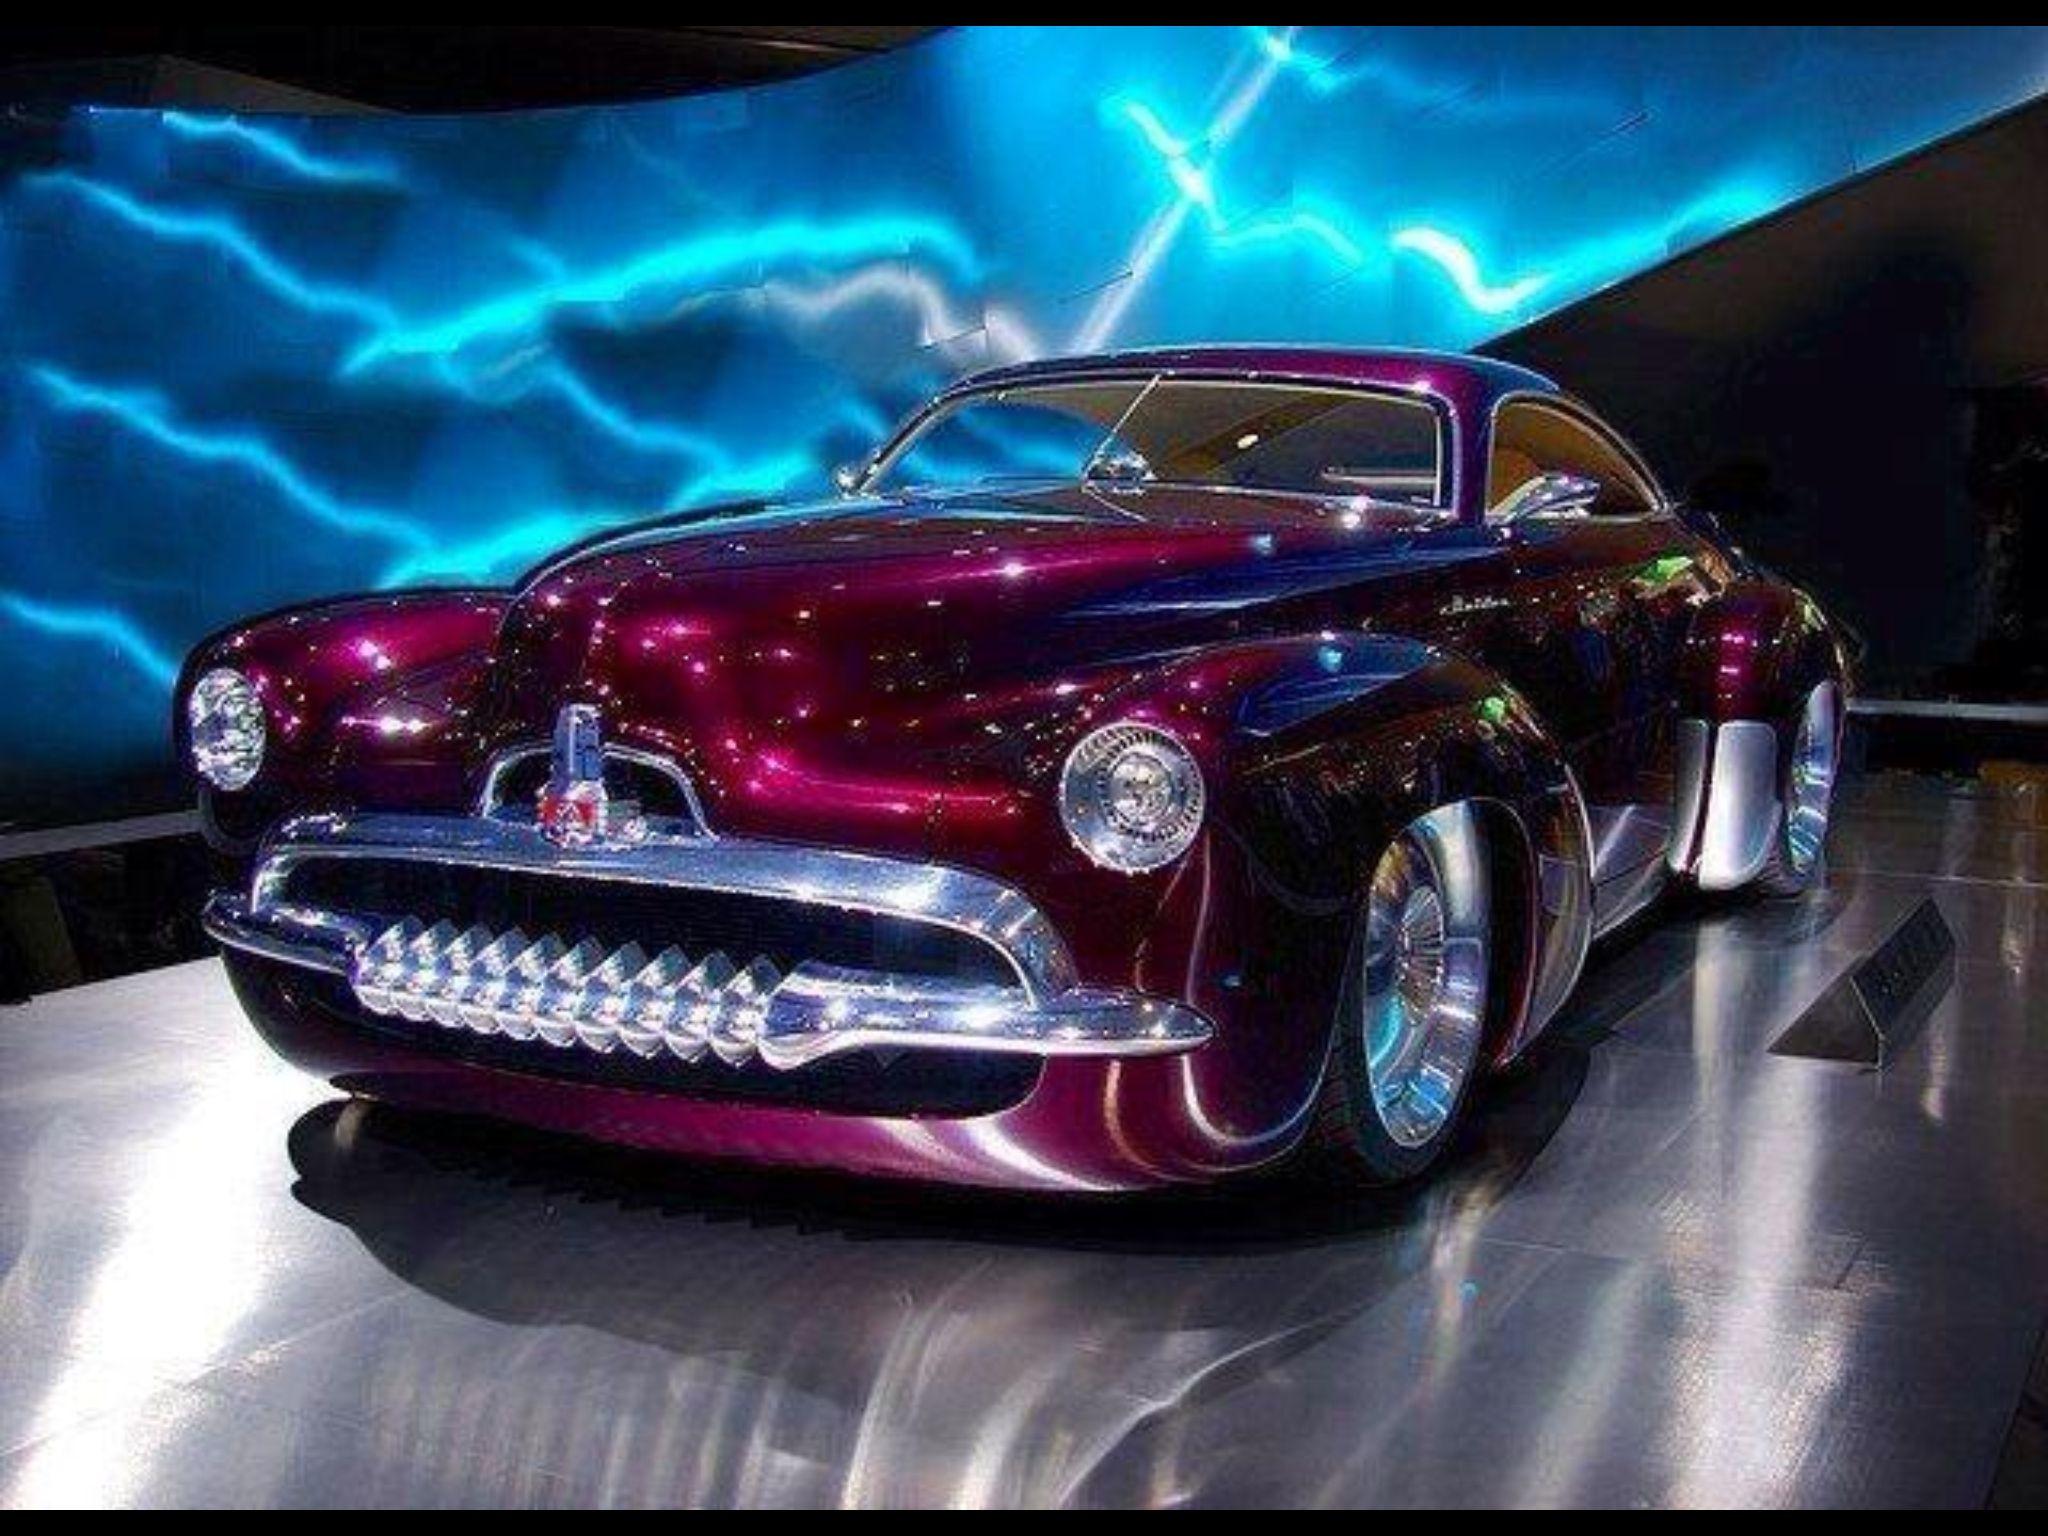 The Best Custom Car Sports Cars Cars Sport Cars